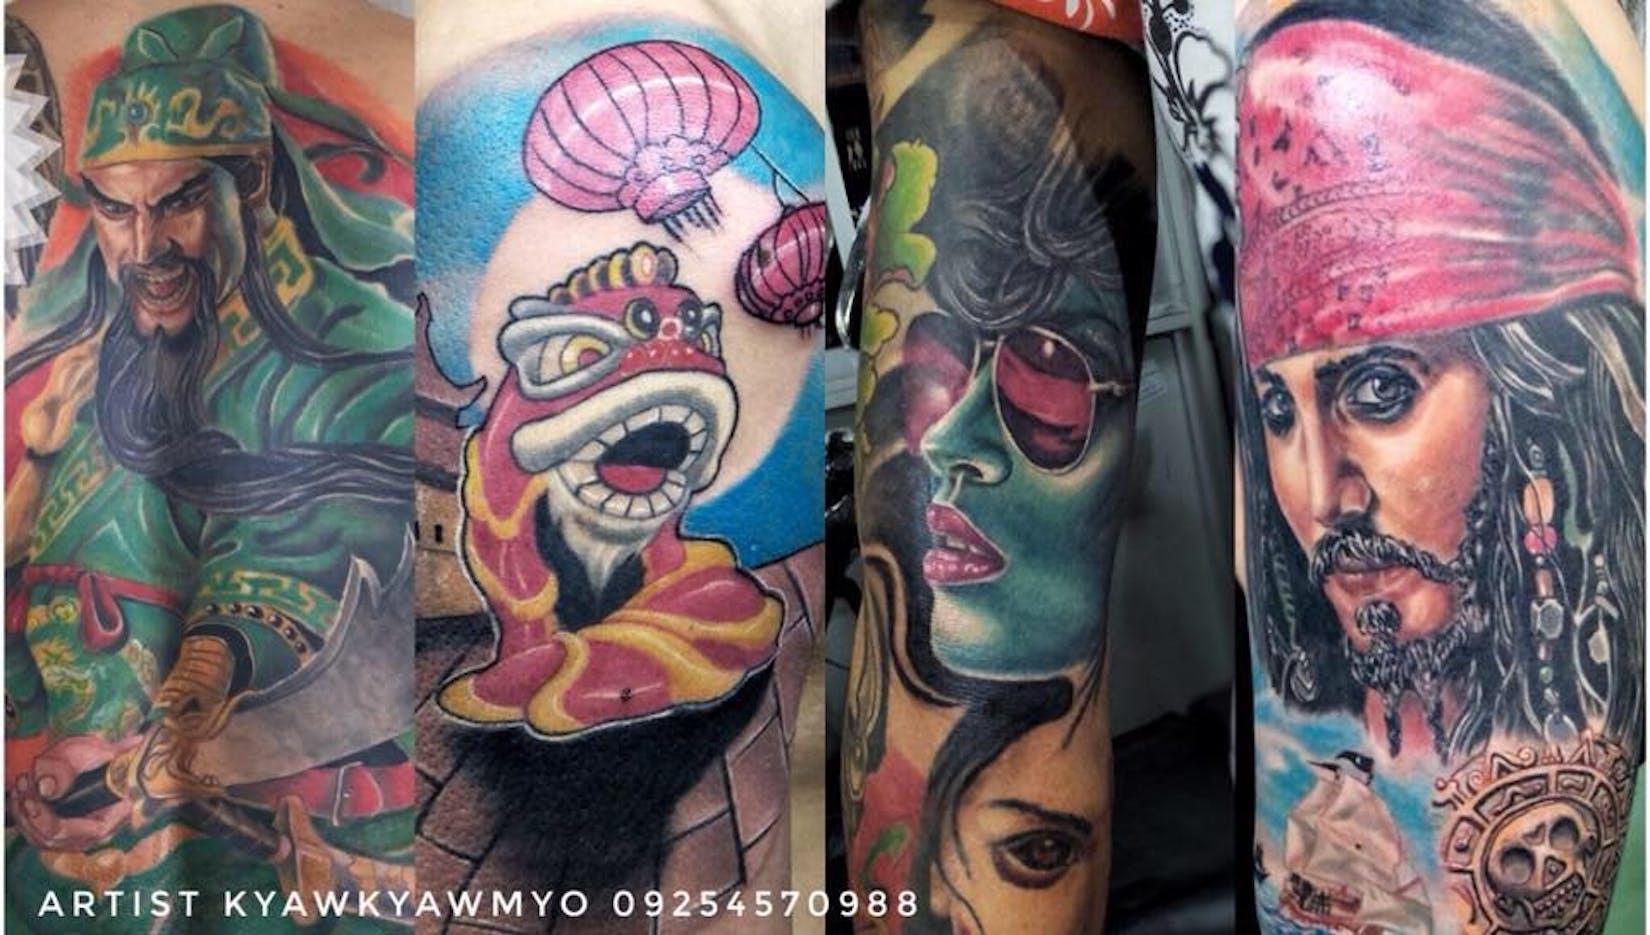 Kyaw Kyaw Myo's Tattoo Studio | Beauty